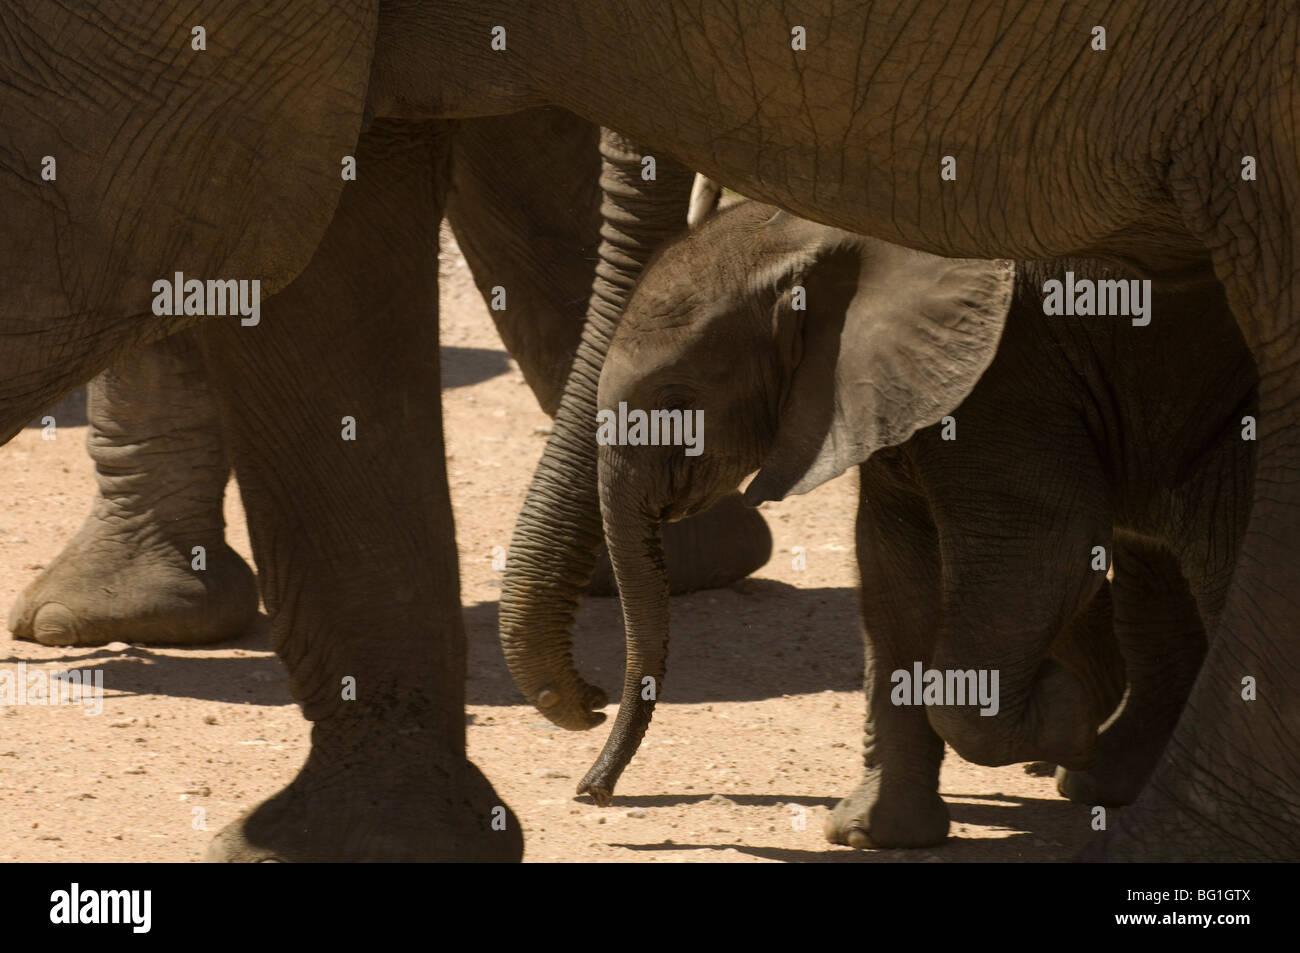 Elephant calf, Amboseli National Park, Kenya, East Africa, Africa - Stock Image